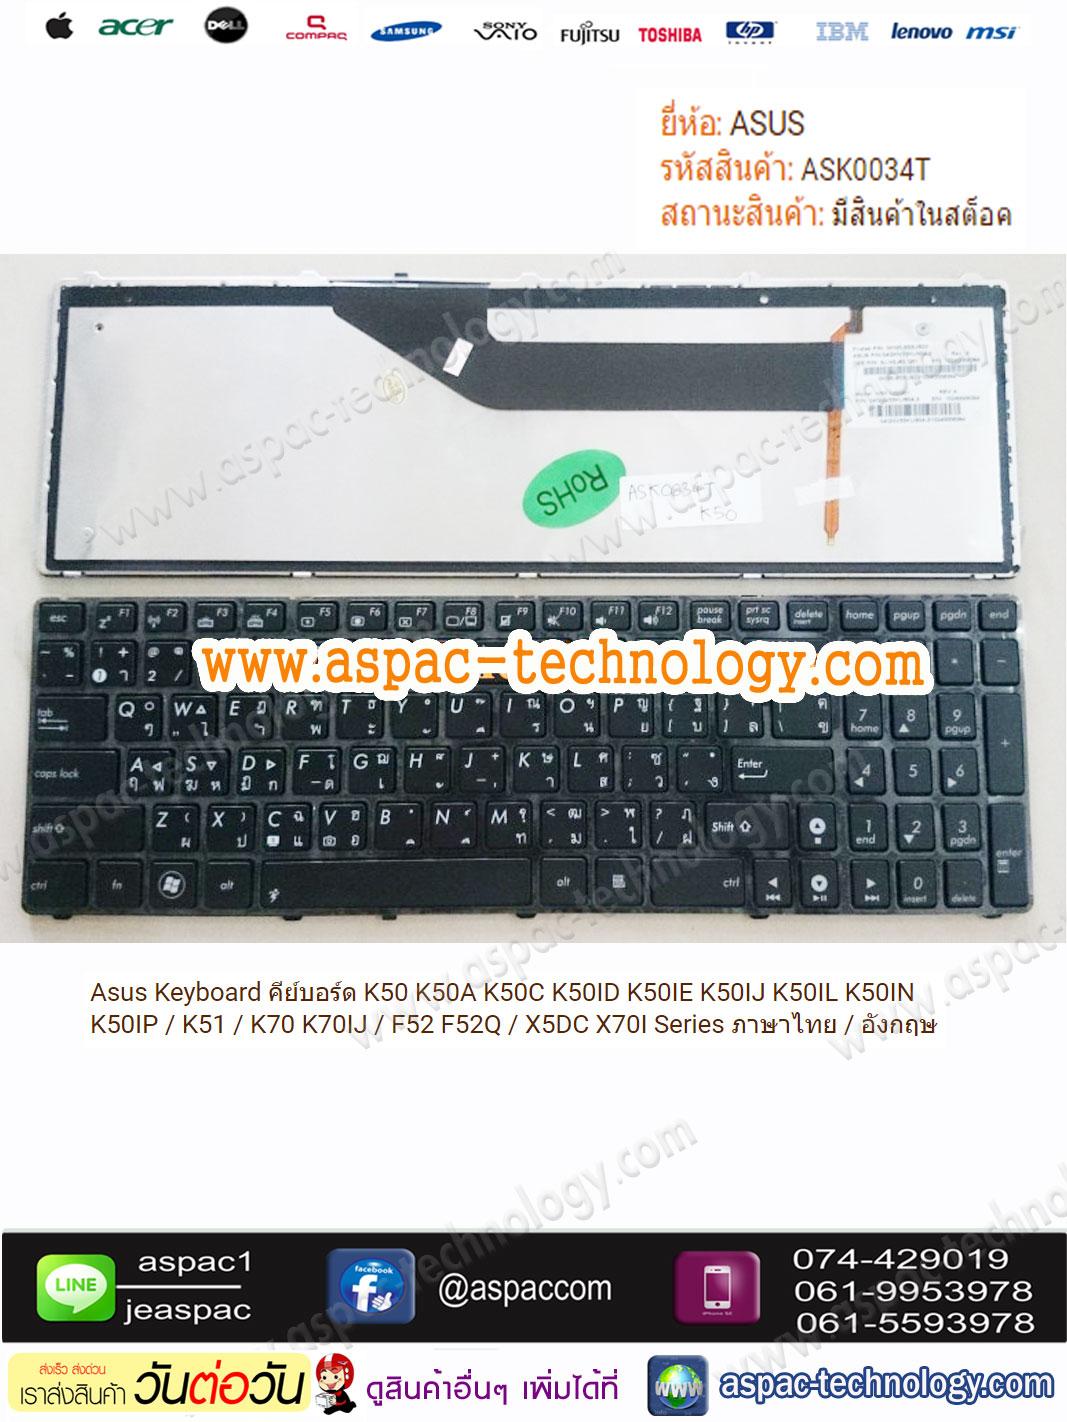 Asus Keyboard คีย์บอร์ด K50 K50A K50C K50ID K50IE K50IJ K50IL K50IN K50IP / K51 / K70 K70IJ / F52 F52Q / X5DC X70I Series ภาษาไทย / อังกฤษ